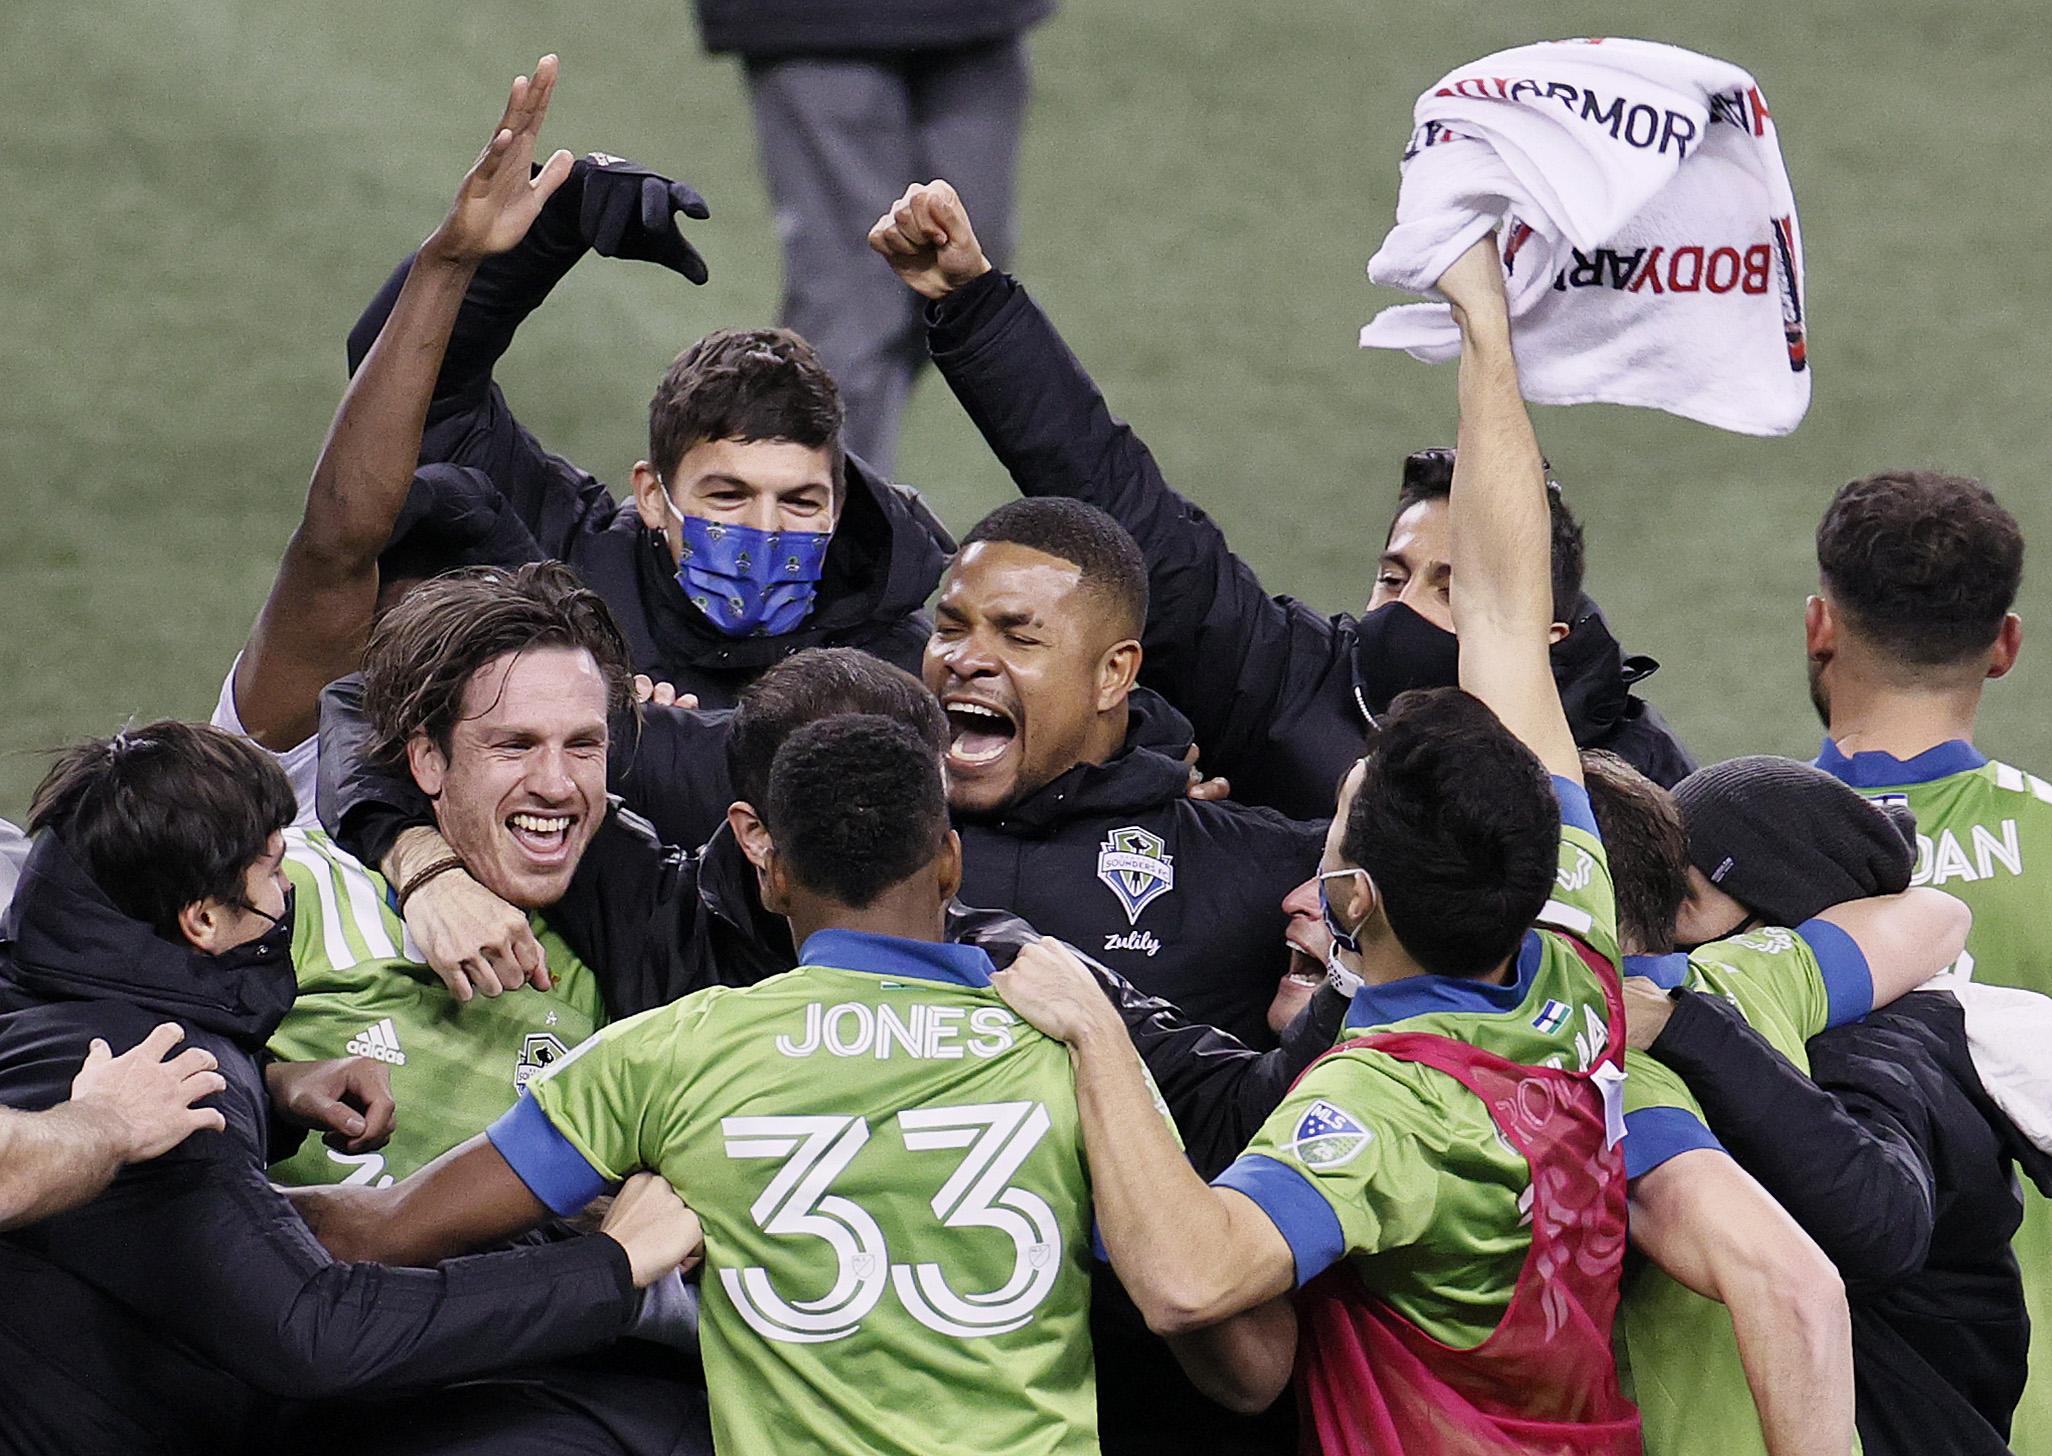 明尼苏达州联合FC V Seattle Loaders:Western会议决赛 -  MLS杯季后赛